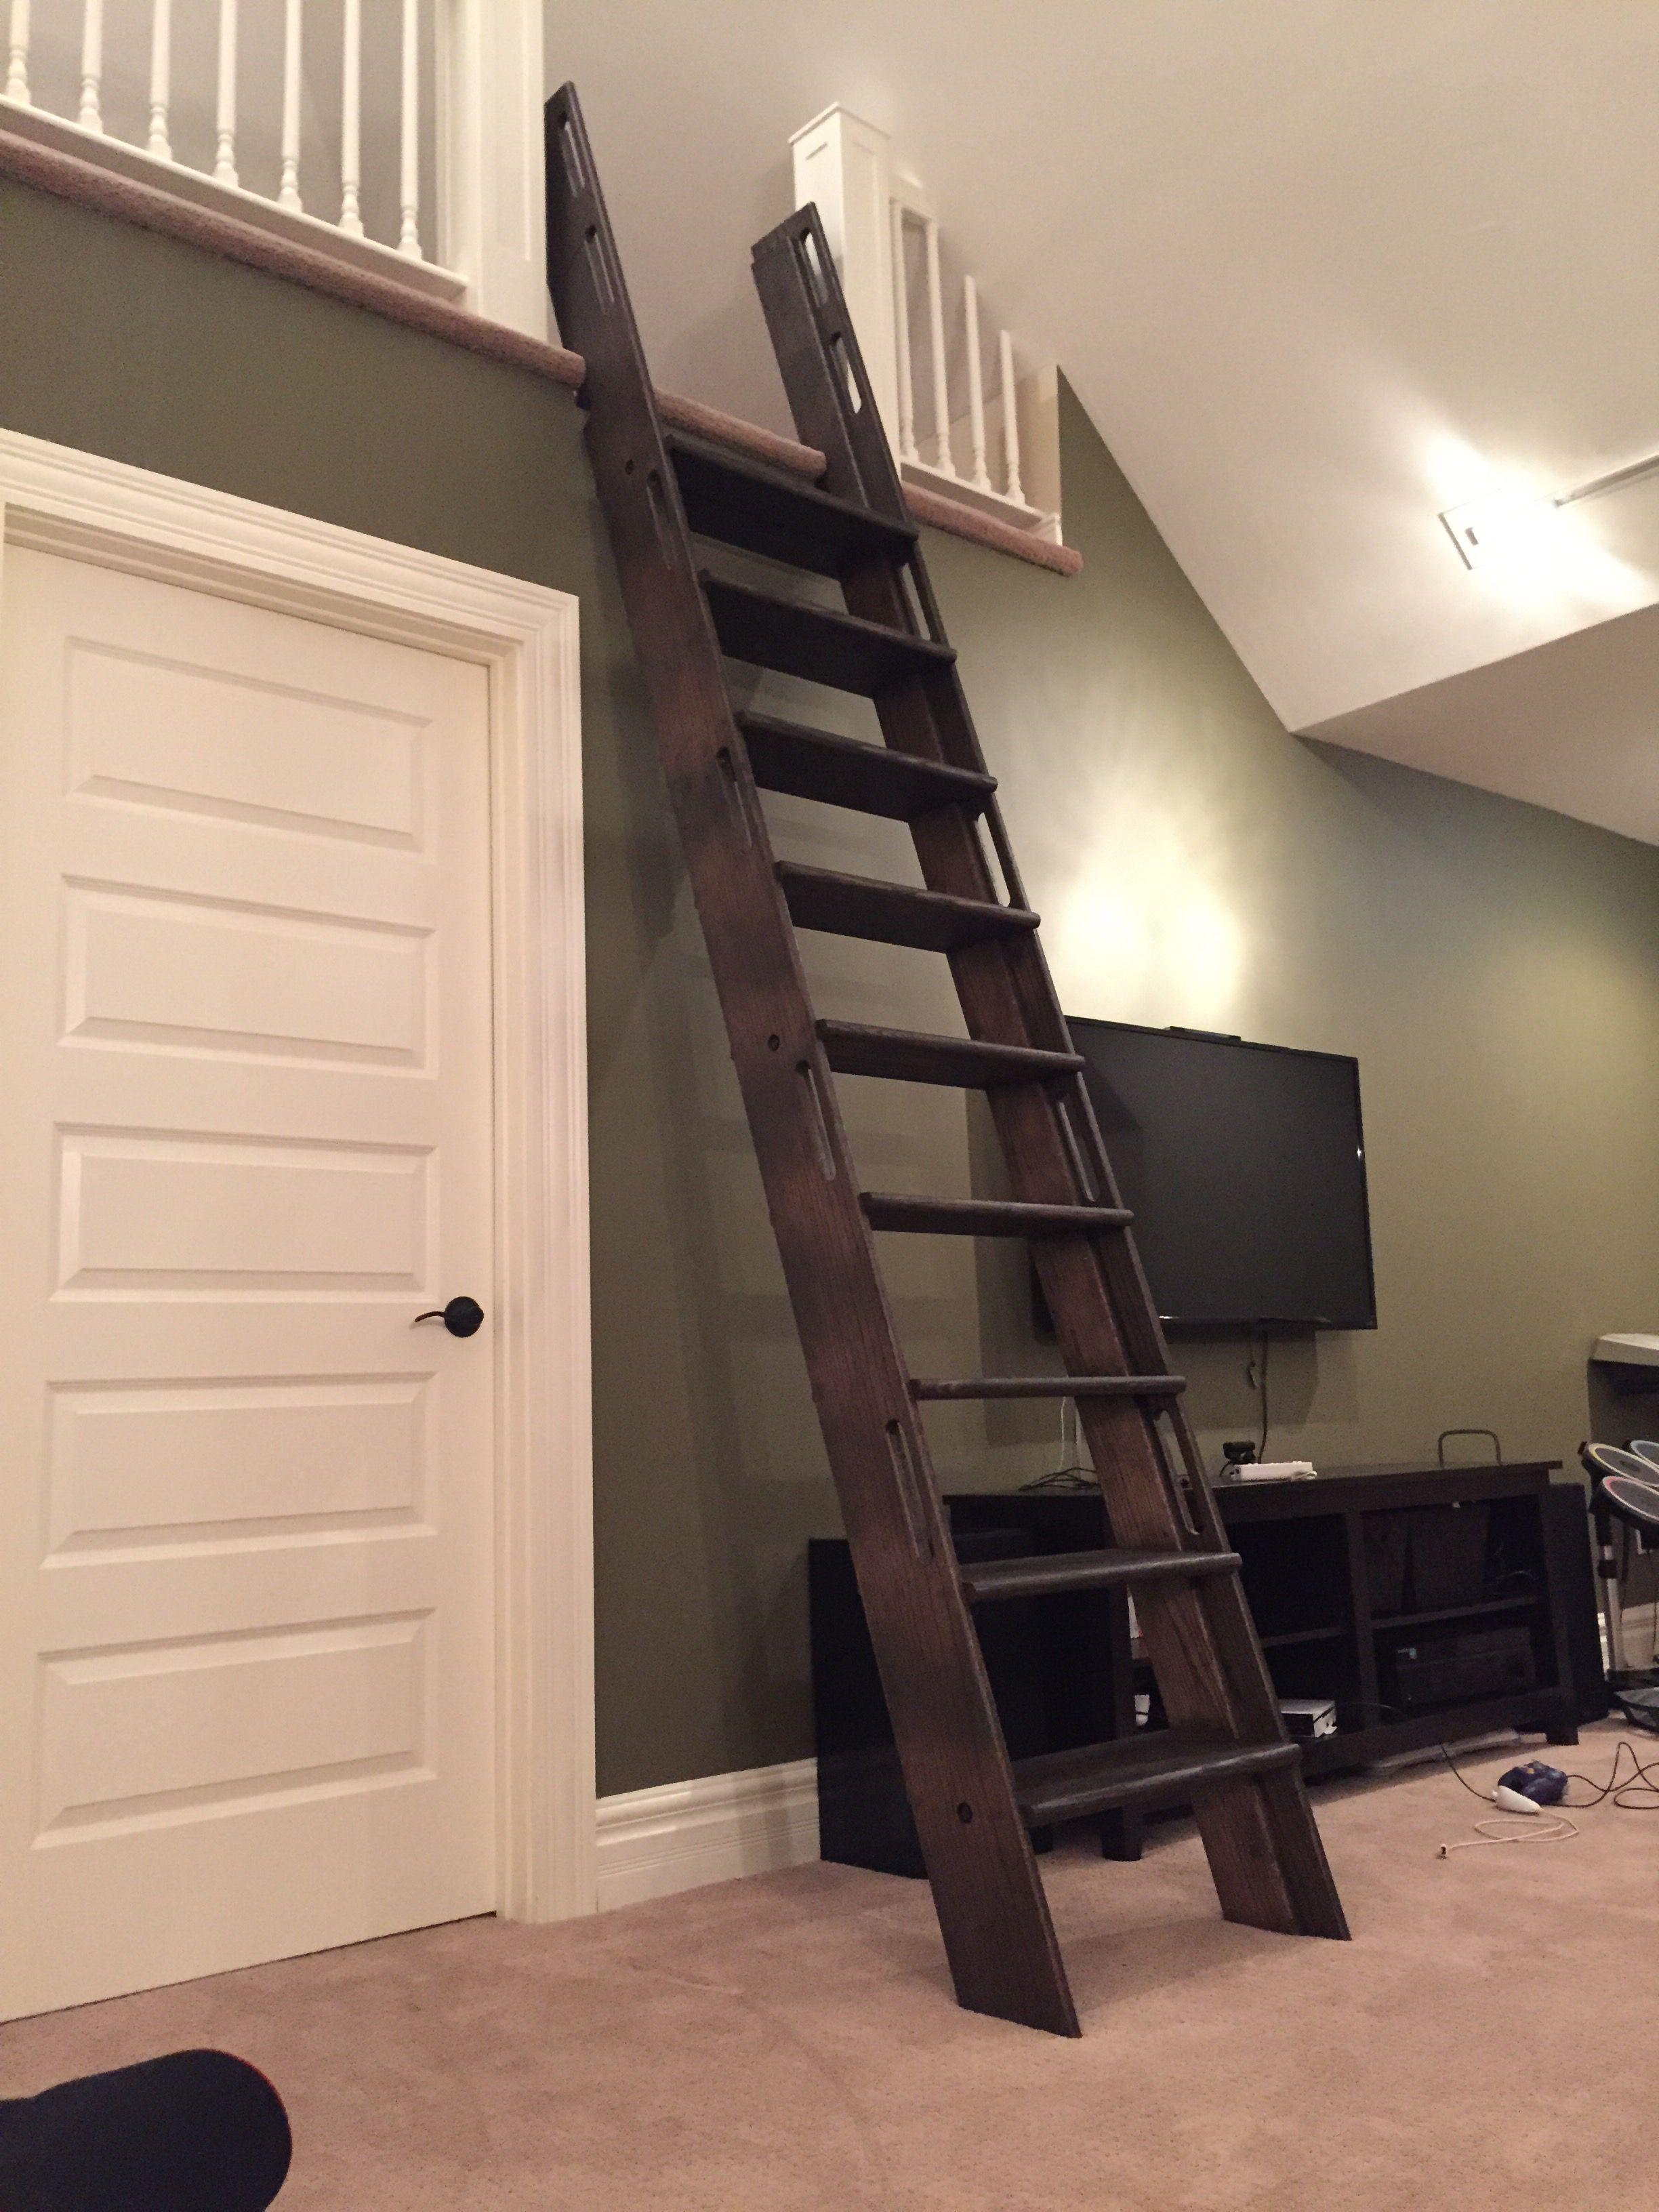 Loft Ladder Loft Ladders Pinterest Loft ladders and